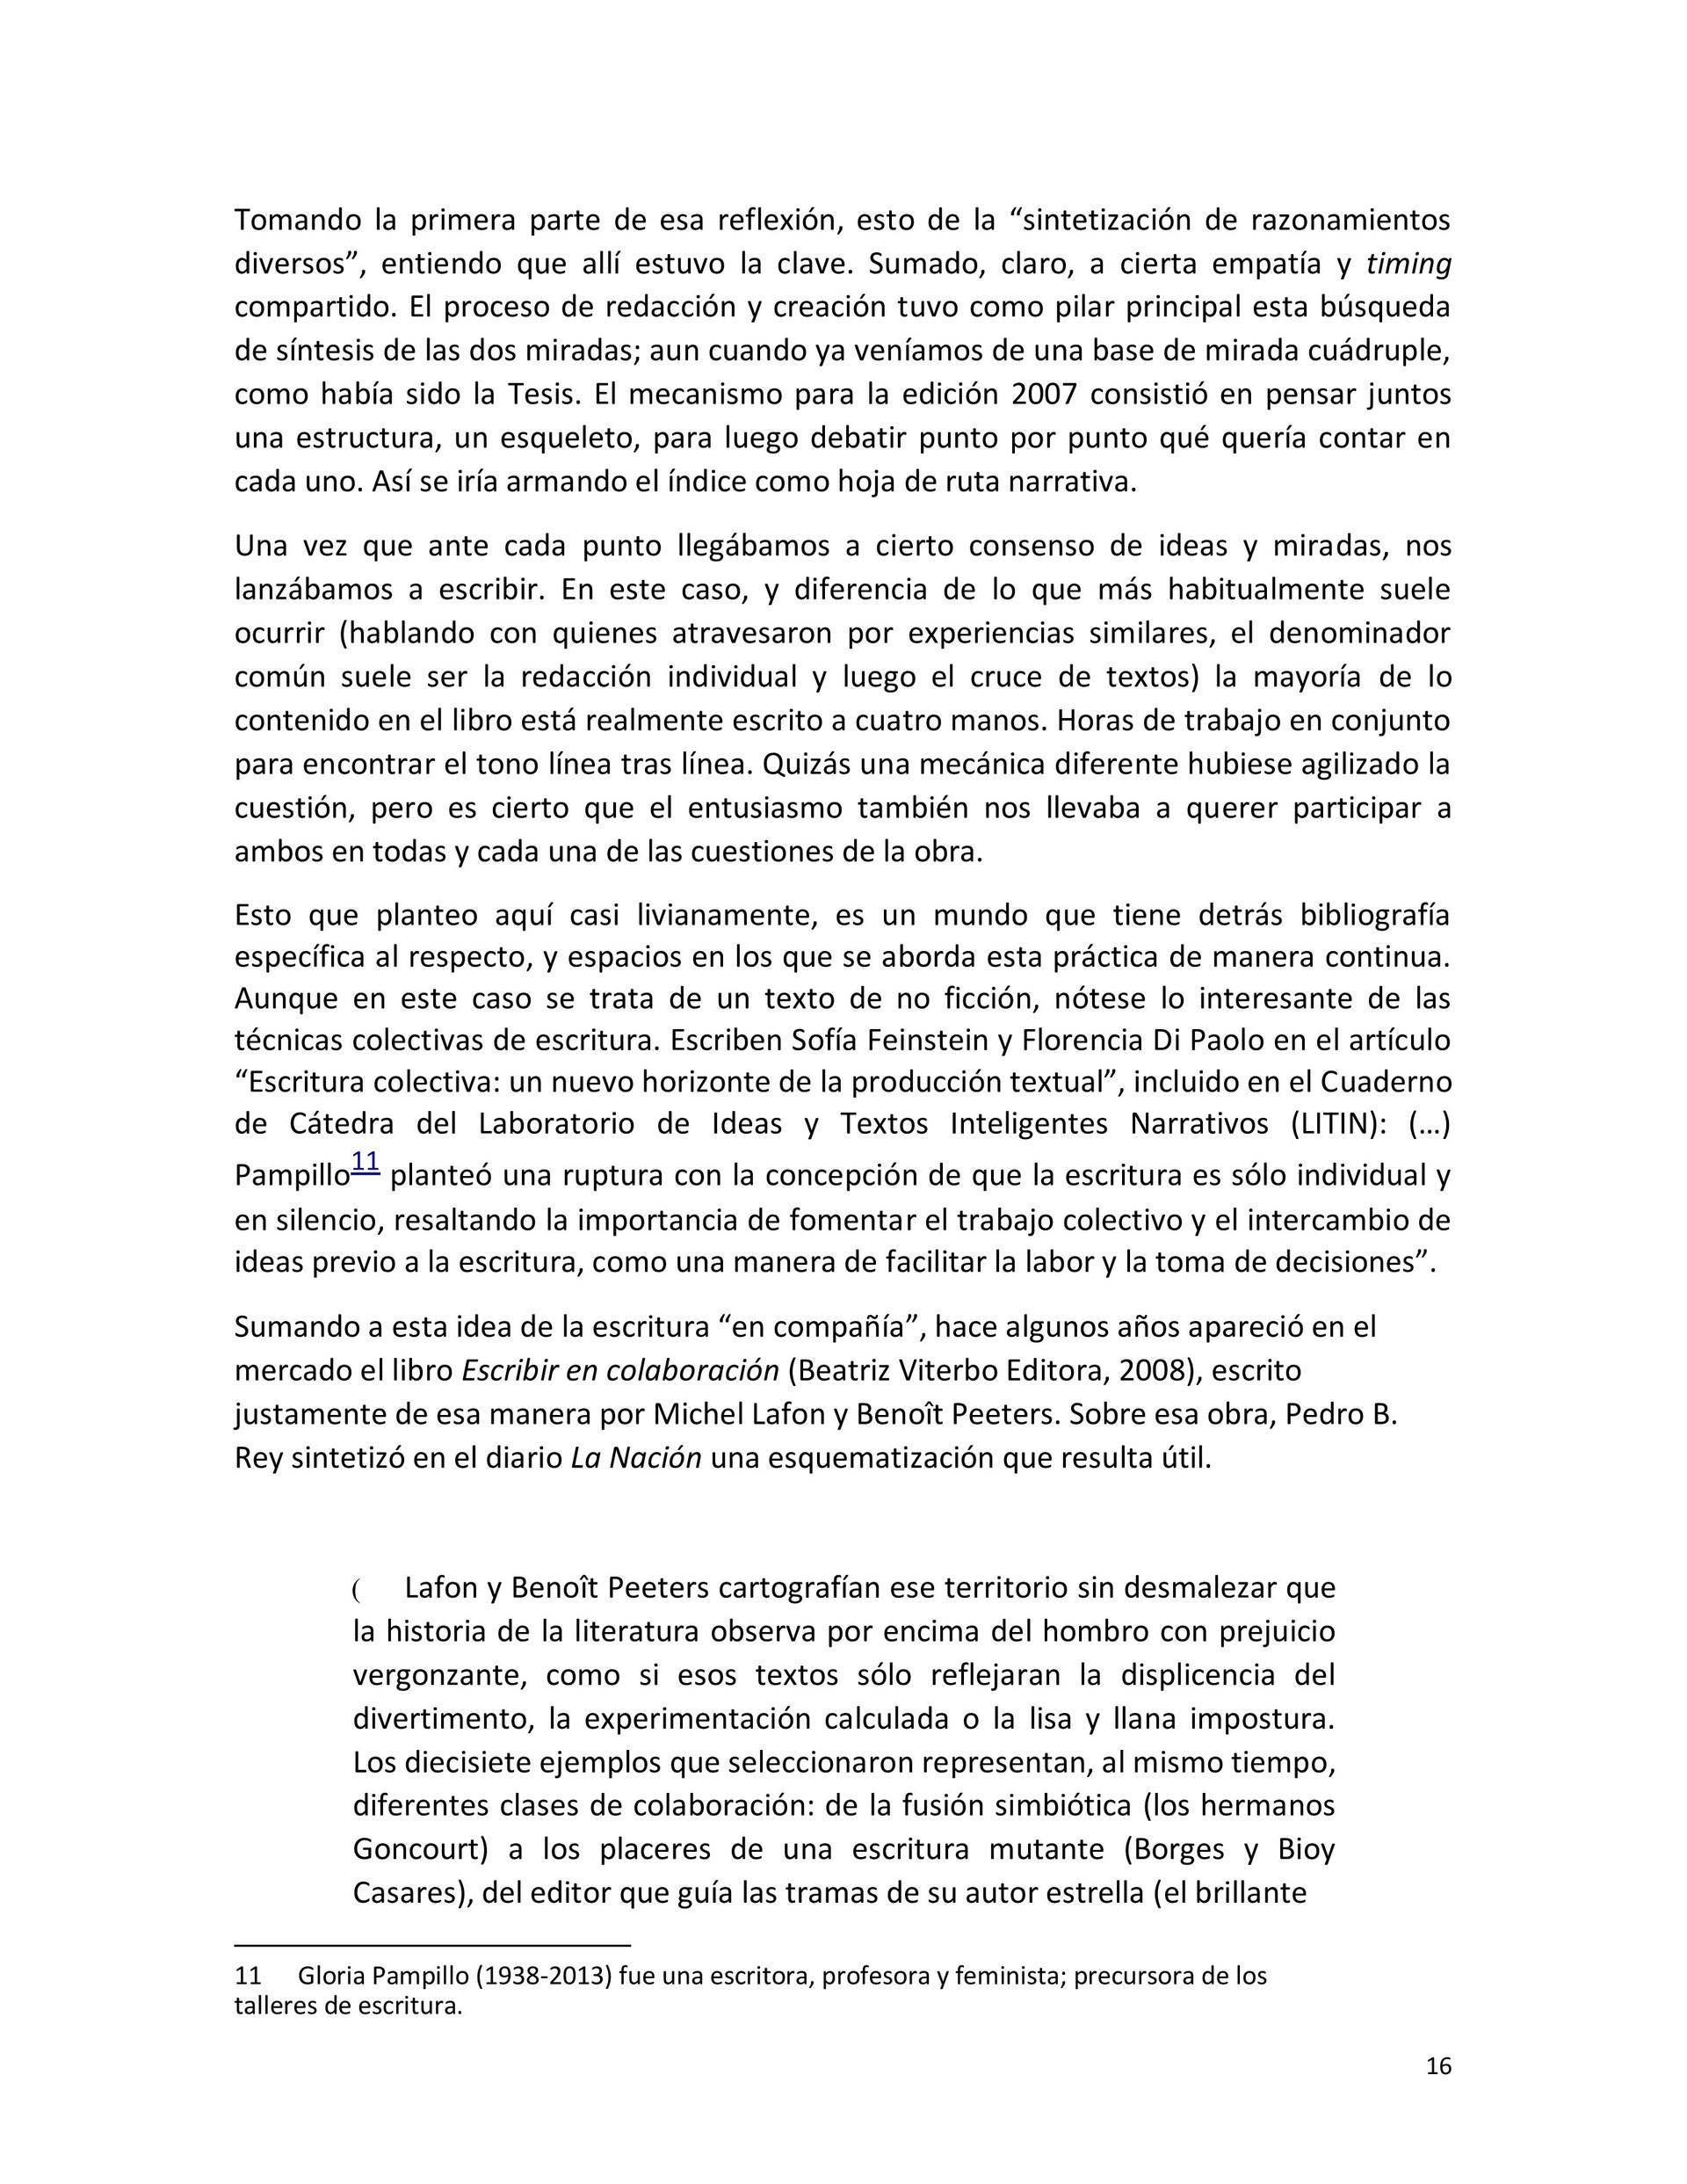 estacion_Page_15.jpeg